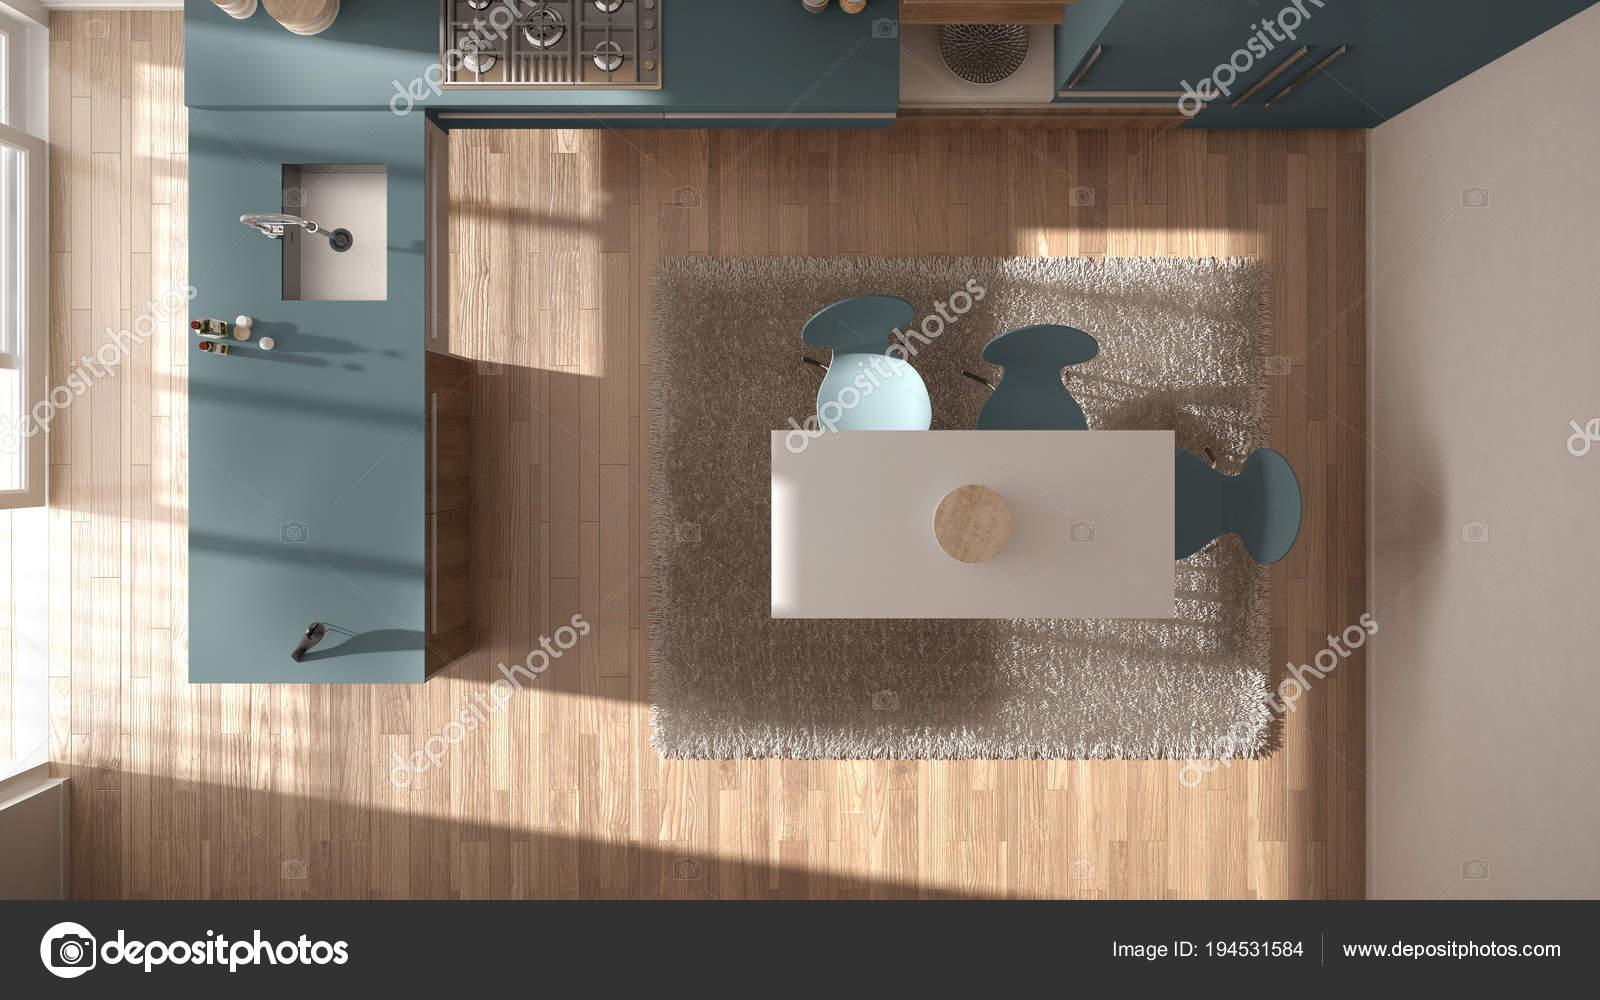 blue kitchen rugs drawer inserts for spices 顶级景观 现代简约木制厨房与餐桌和地毯 白色和蓝色建筑室内设计 图库 照片作者archiviz